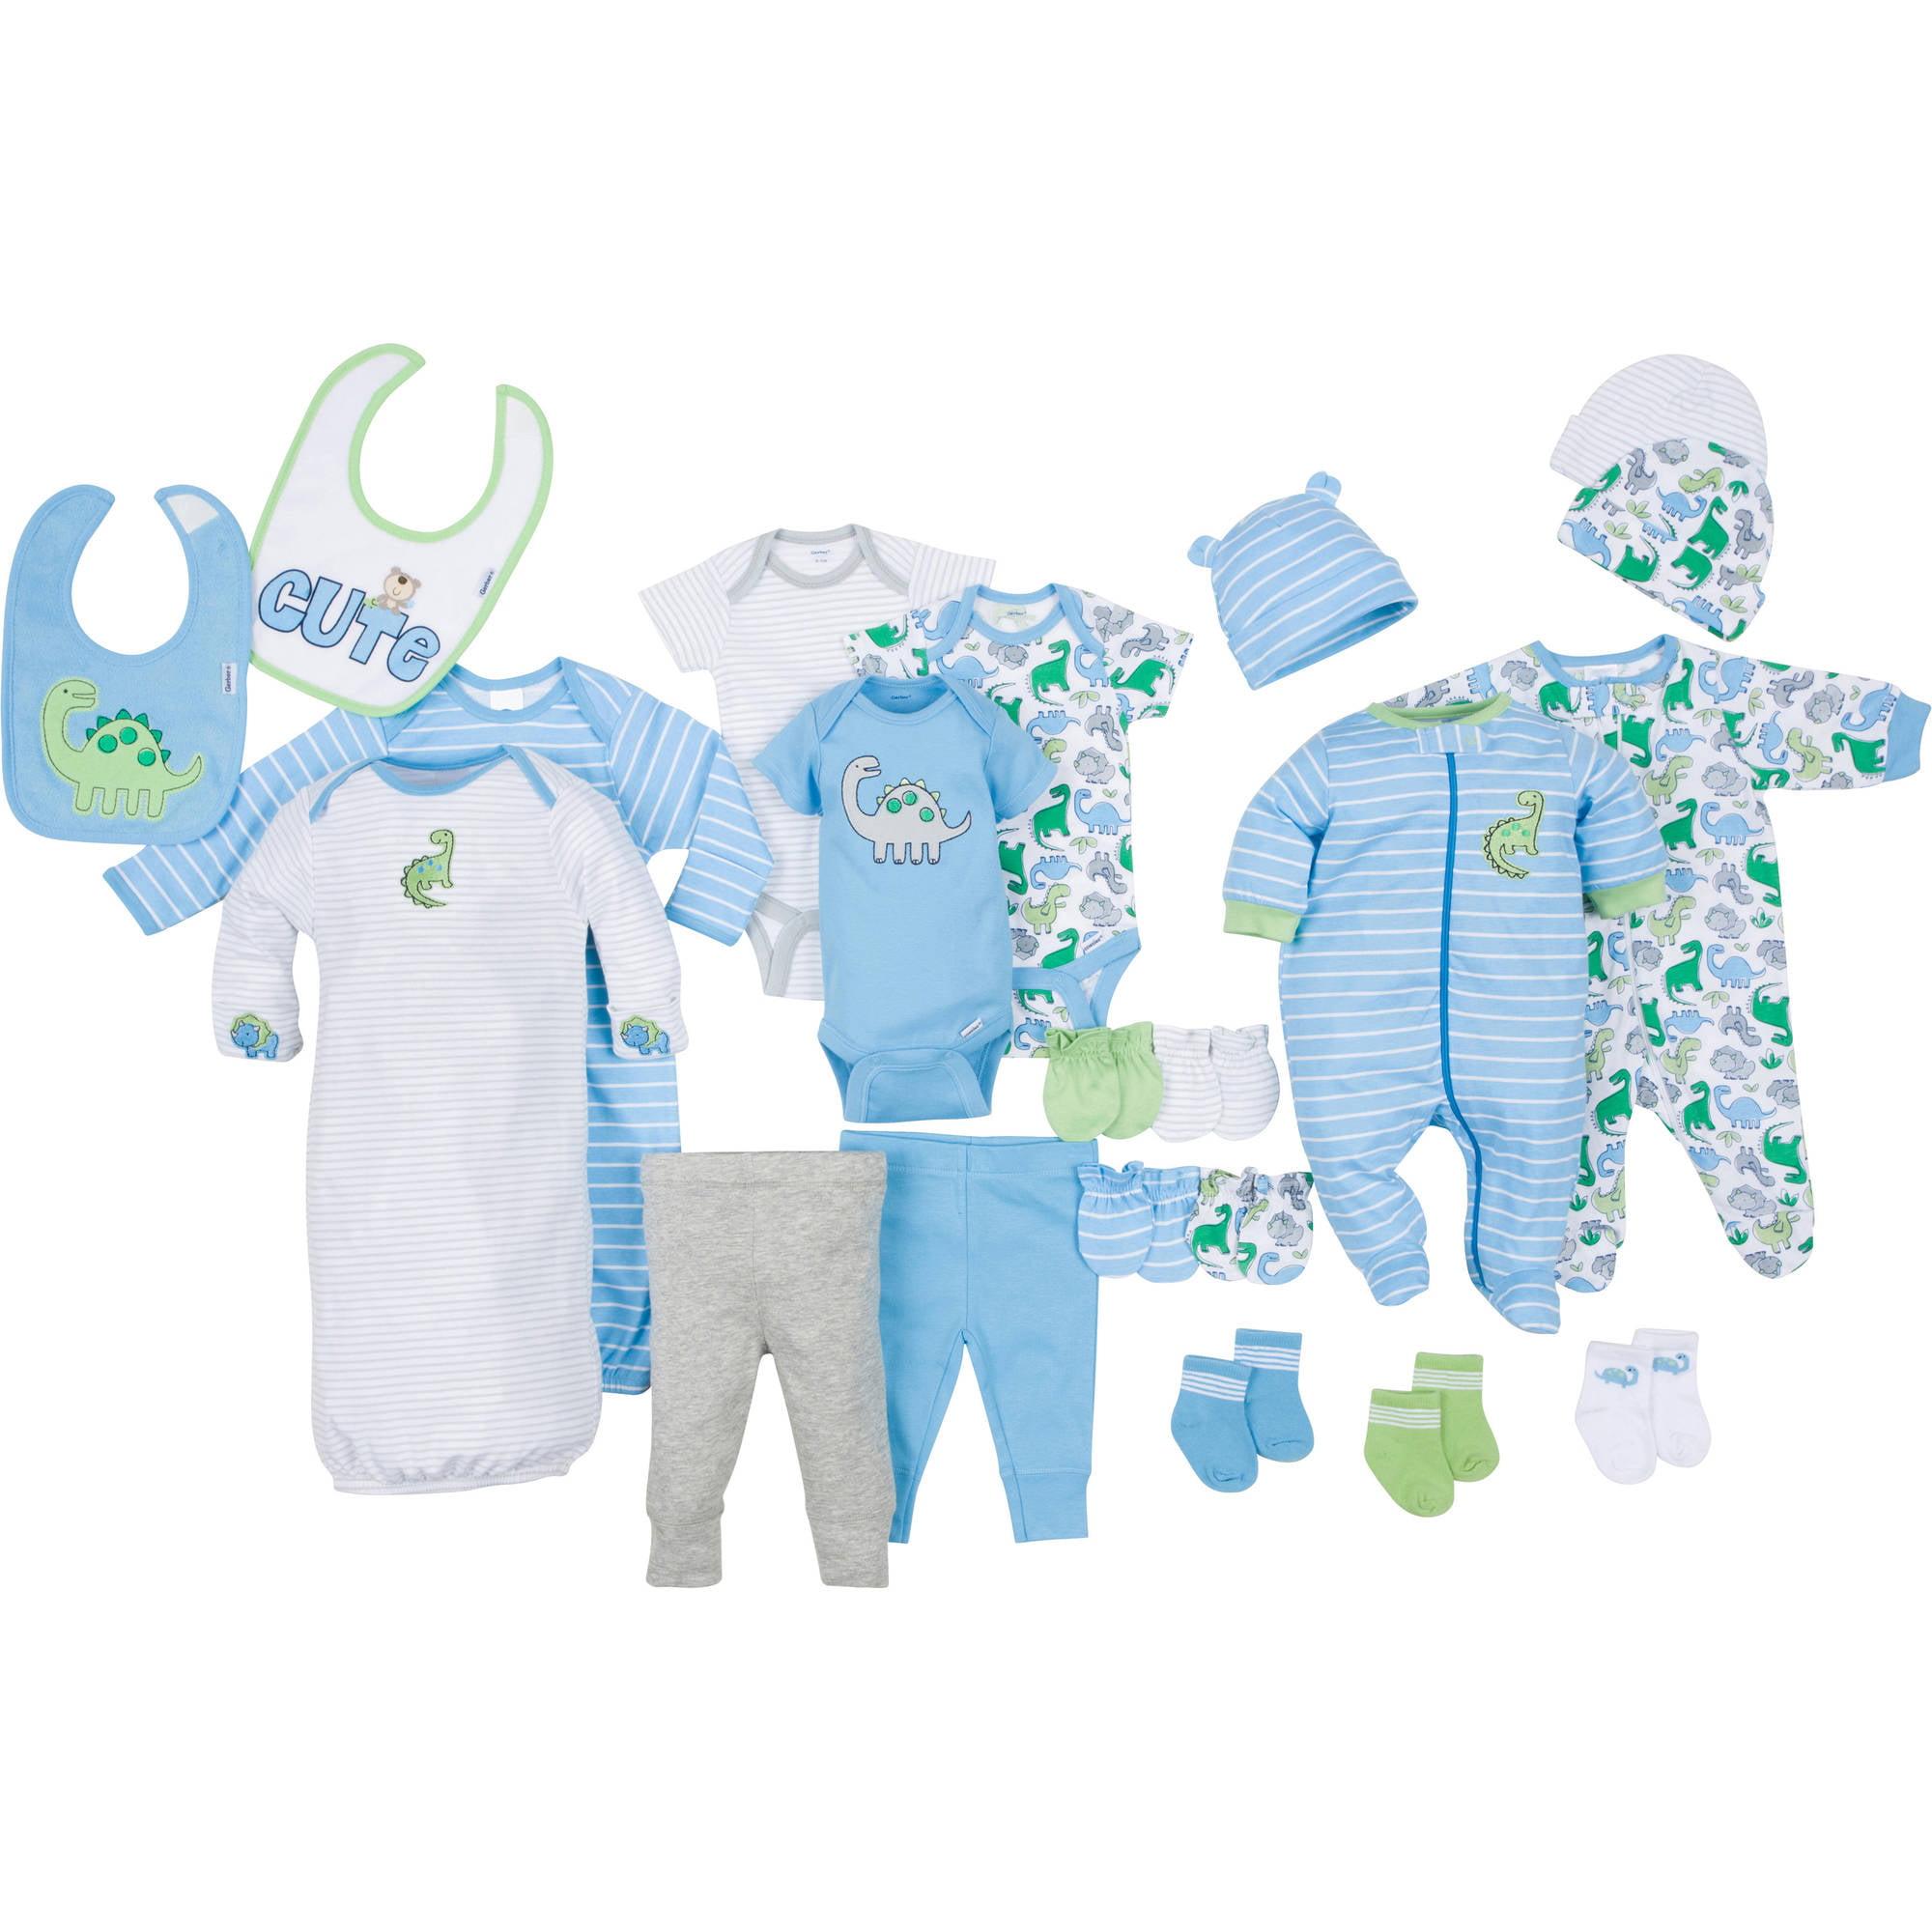 Gerber Newborn Baby Boy Perfect Baby Shower Gift 22-Piece Layette Set, Age 0-3M